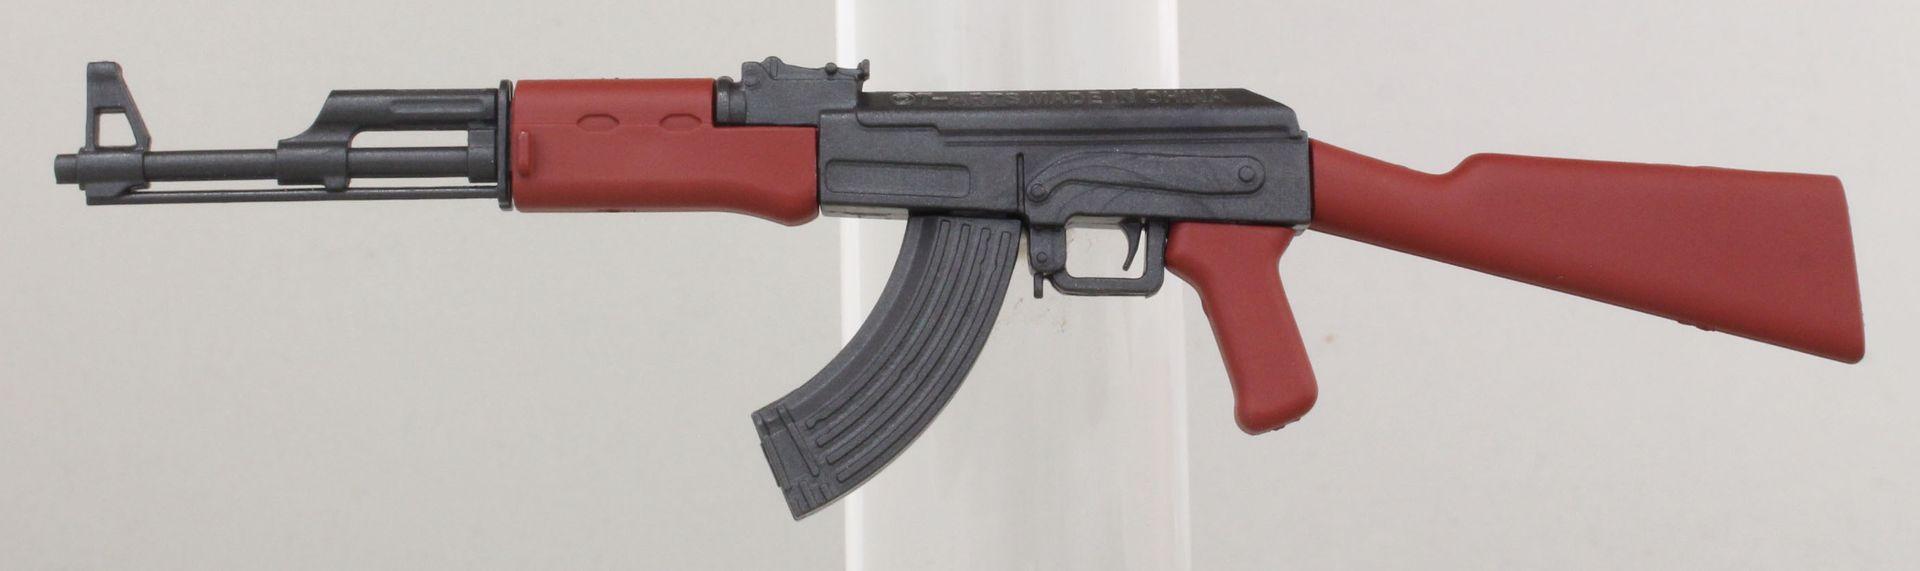 AK-47 Standard(スタンダード)